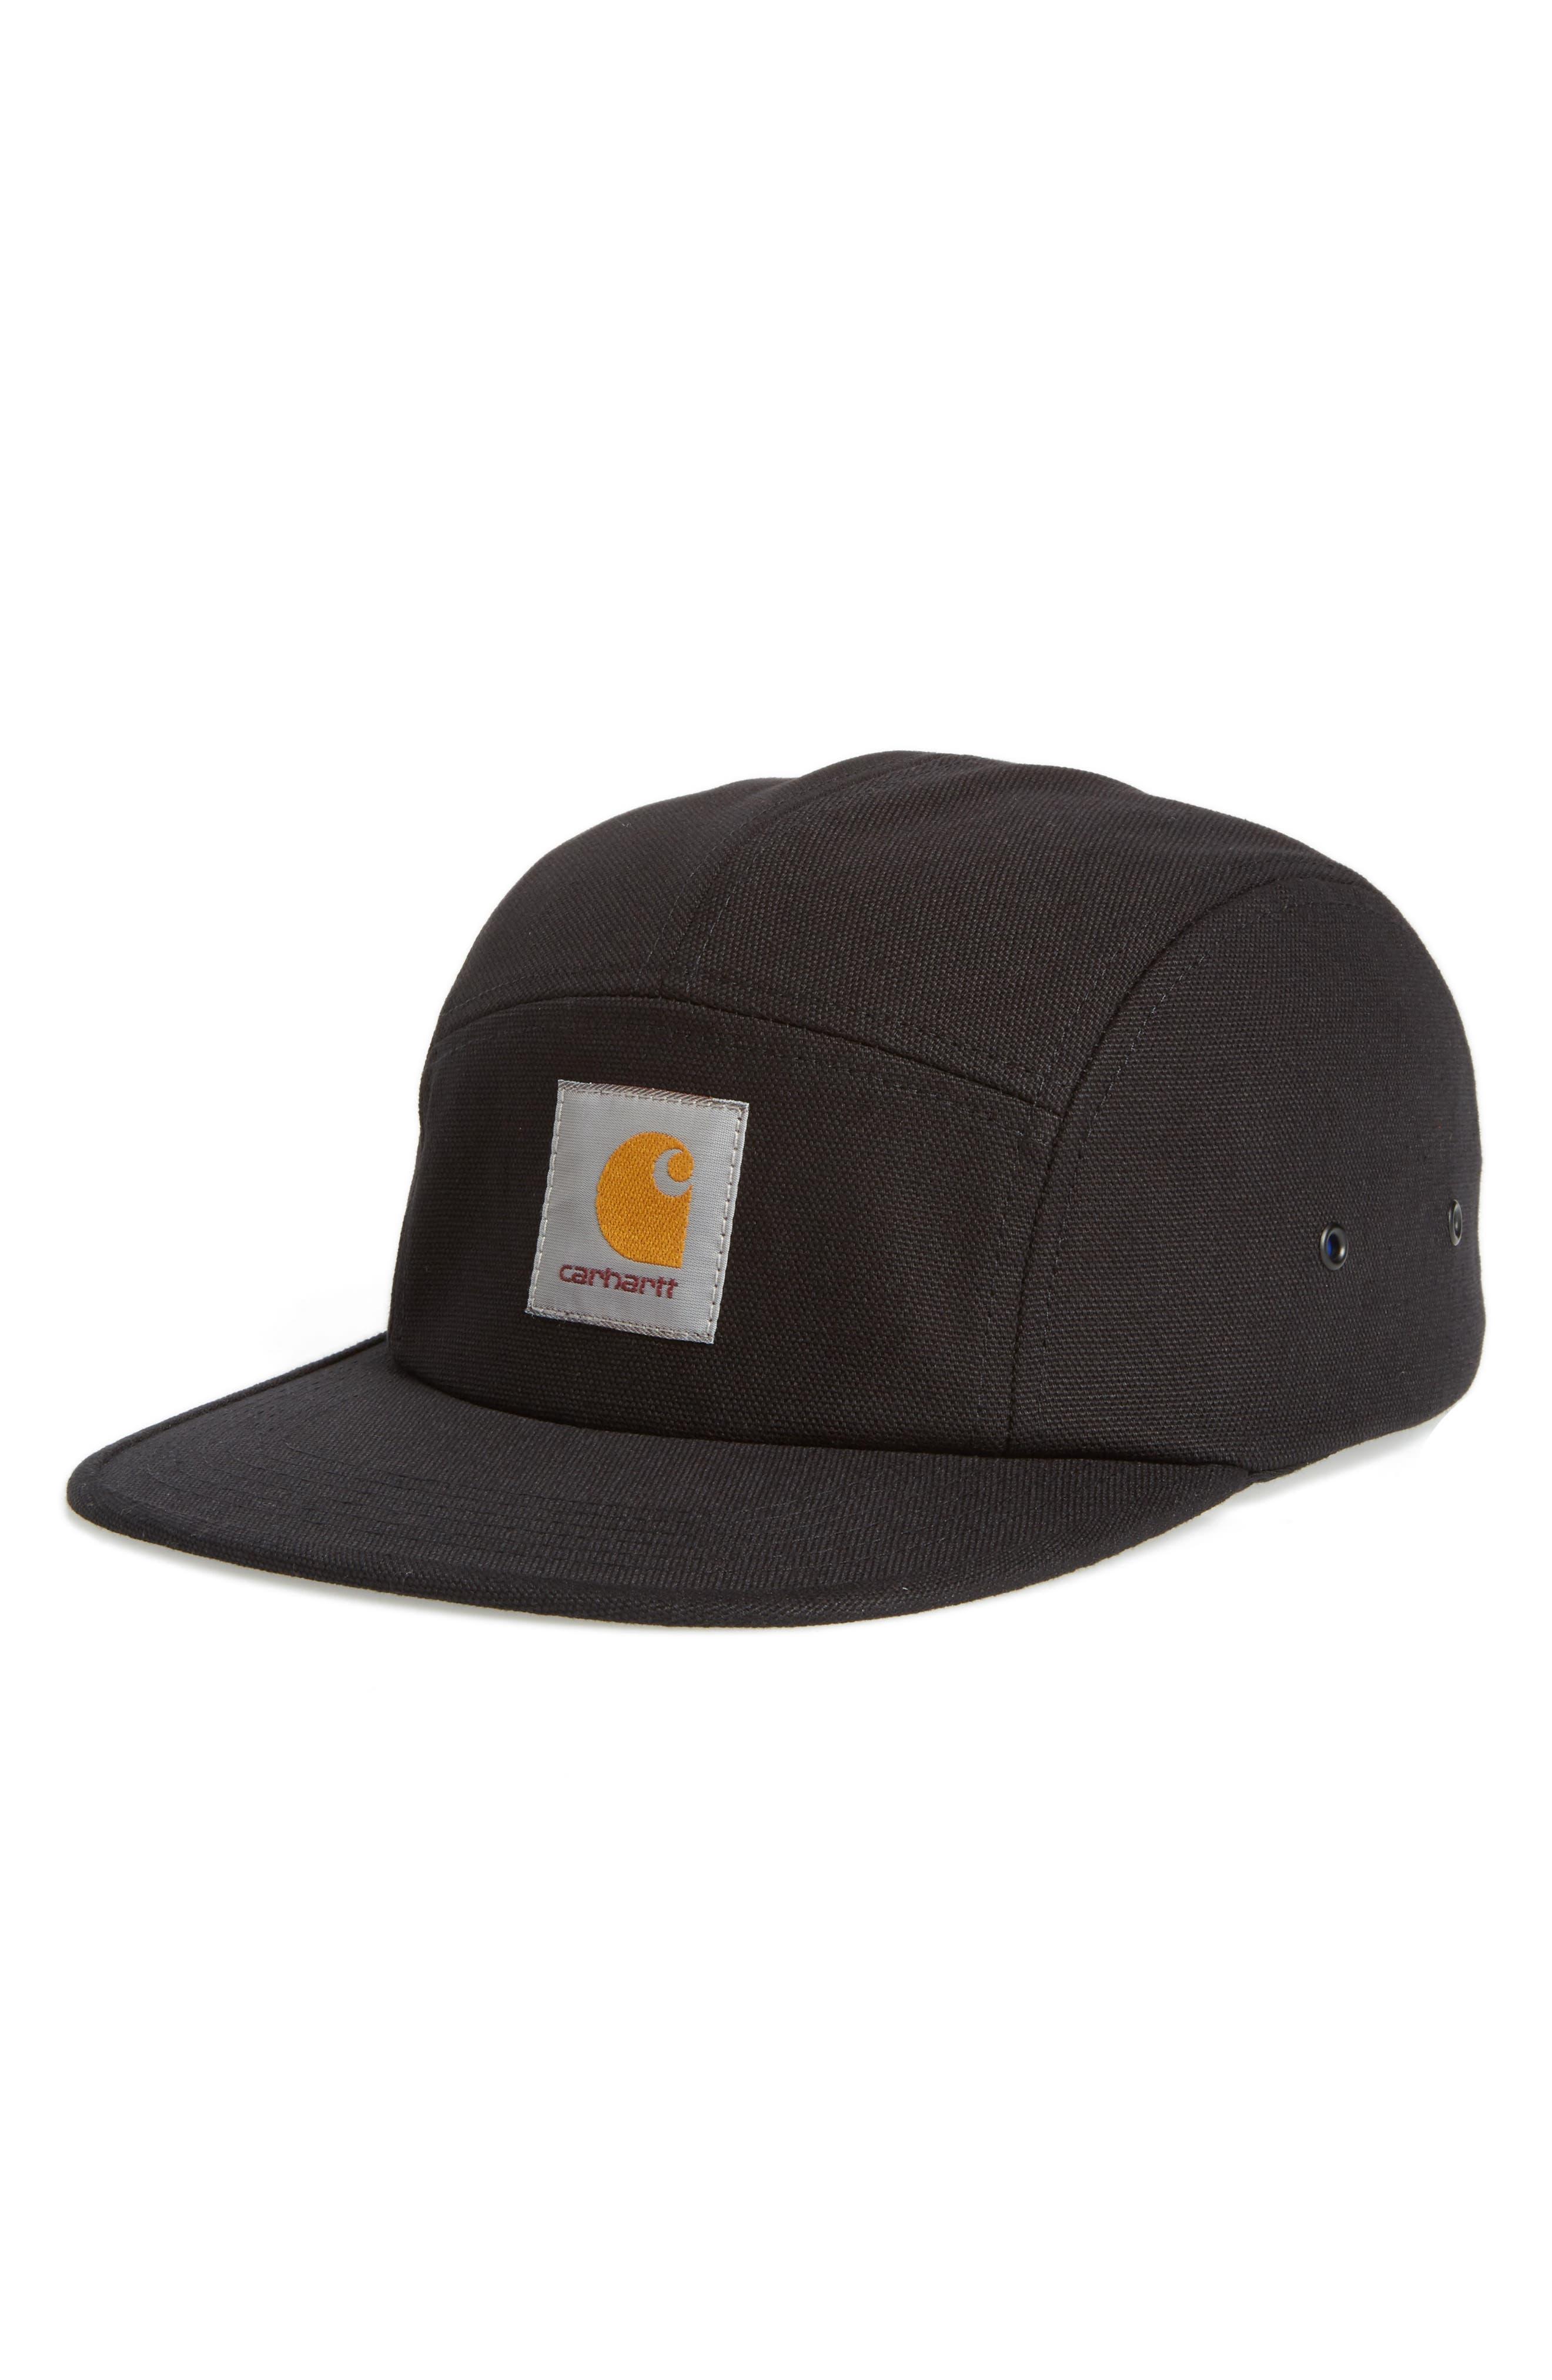 Carhartt Work in Progress Camp Hat